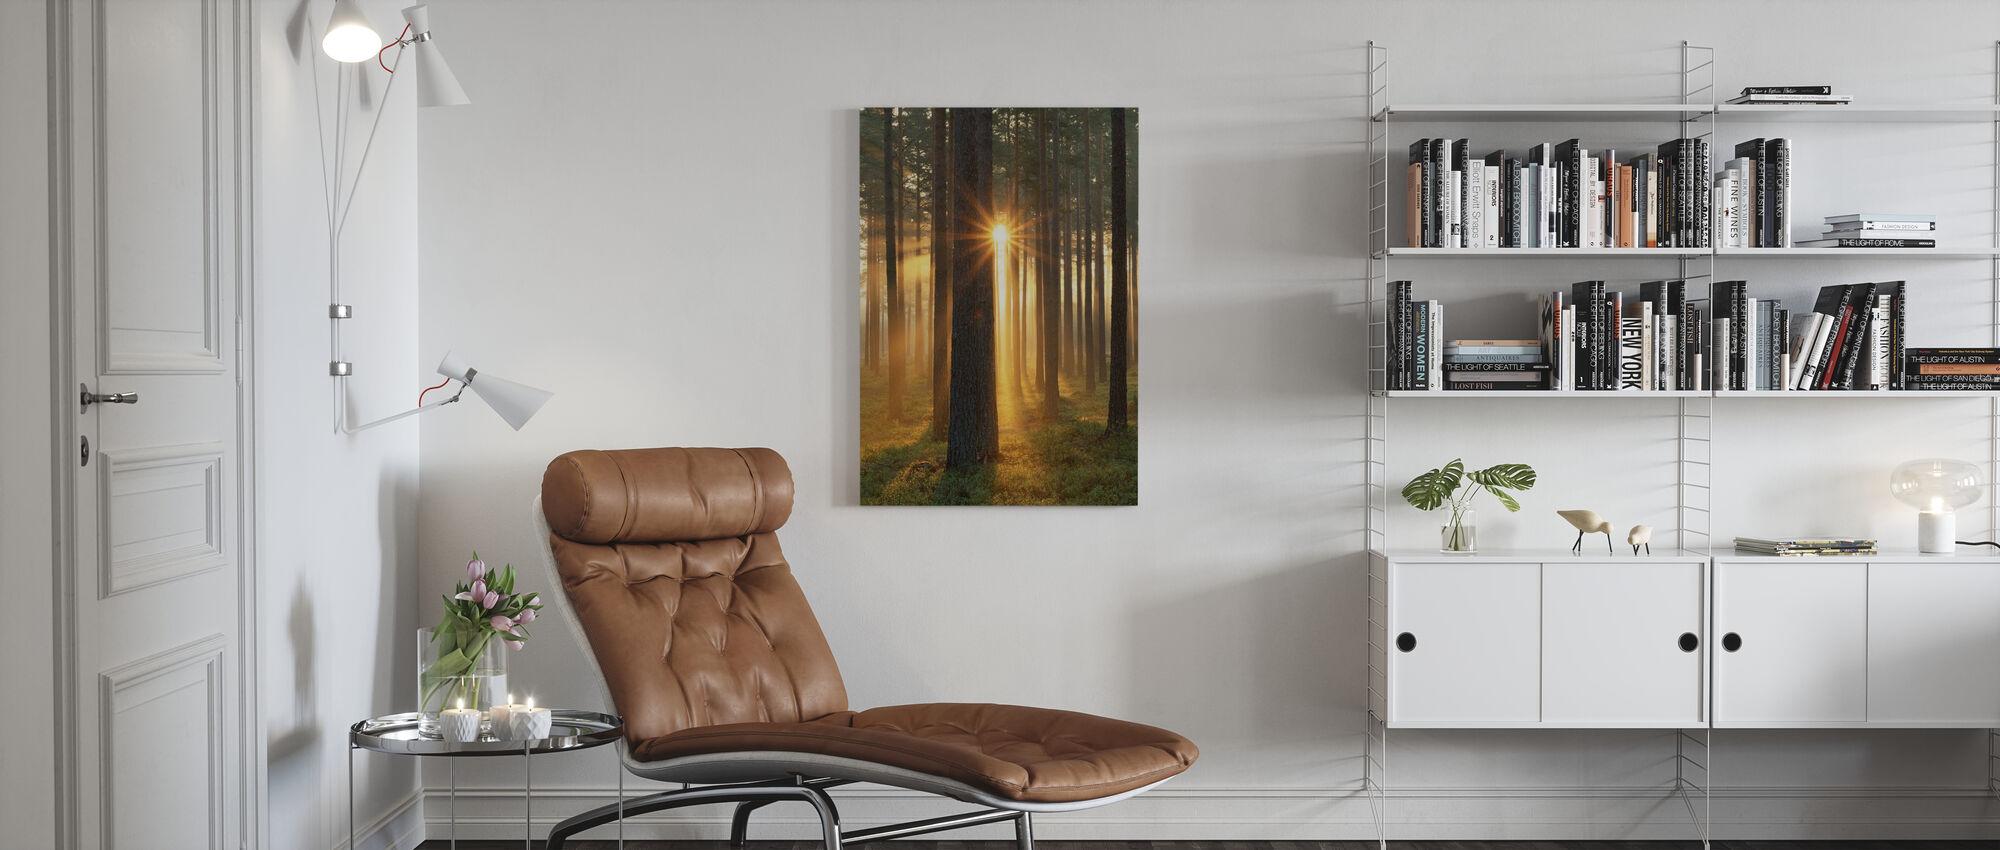 Höst Sunbeam - Canvastavla - Vardagsrum